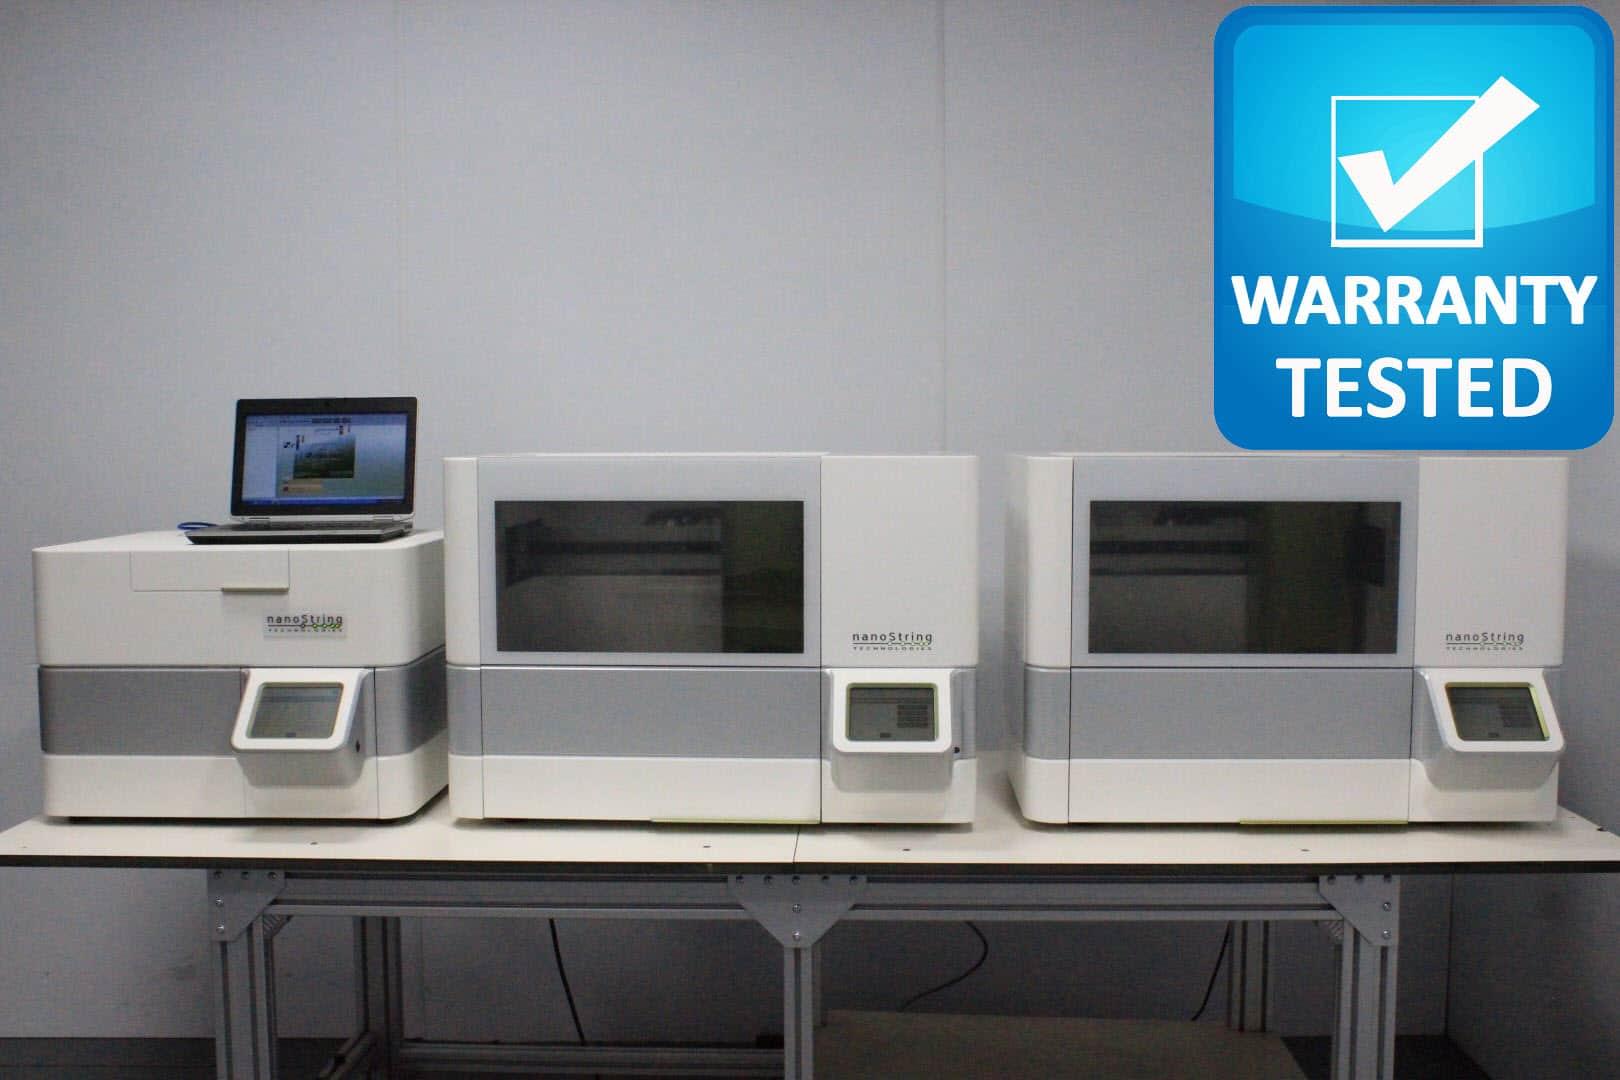 NanoString nCounter MAX Analyzer DNA RNA Analysis System